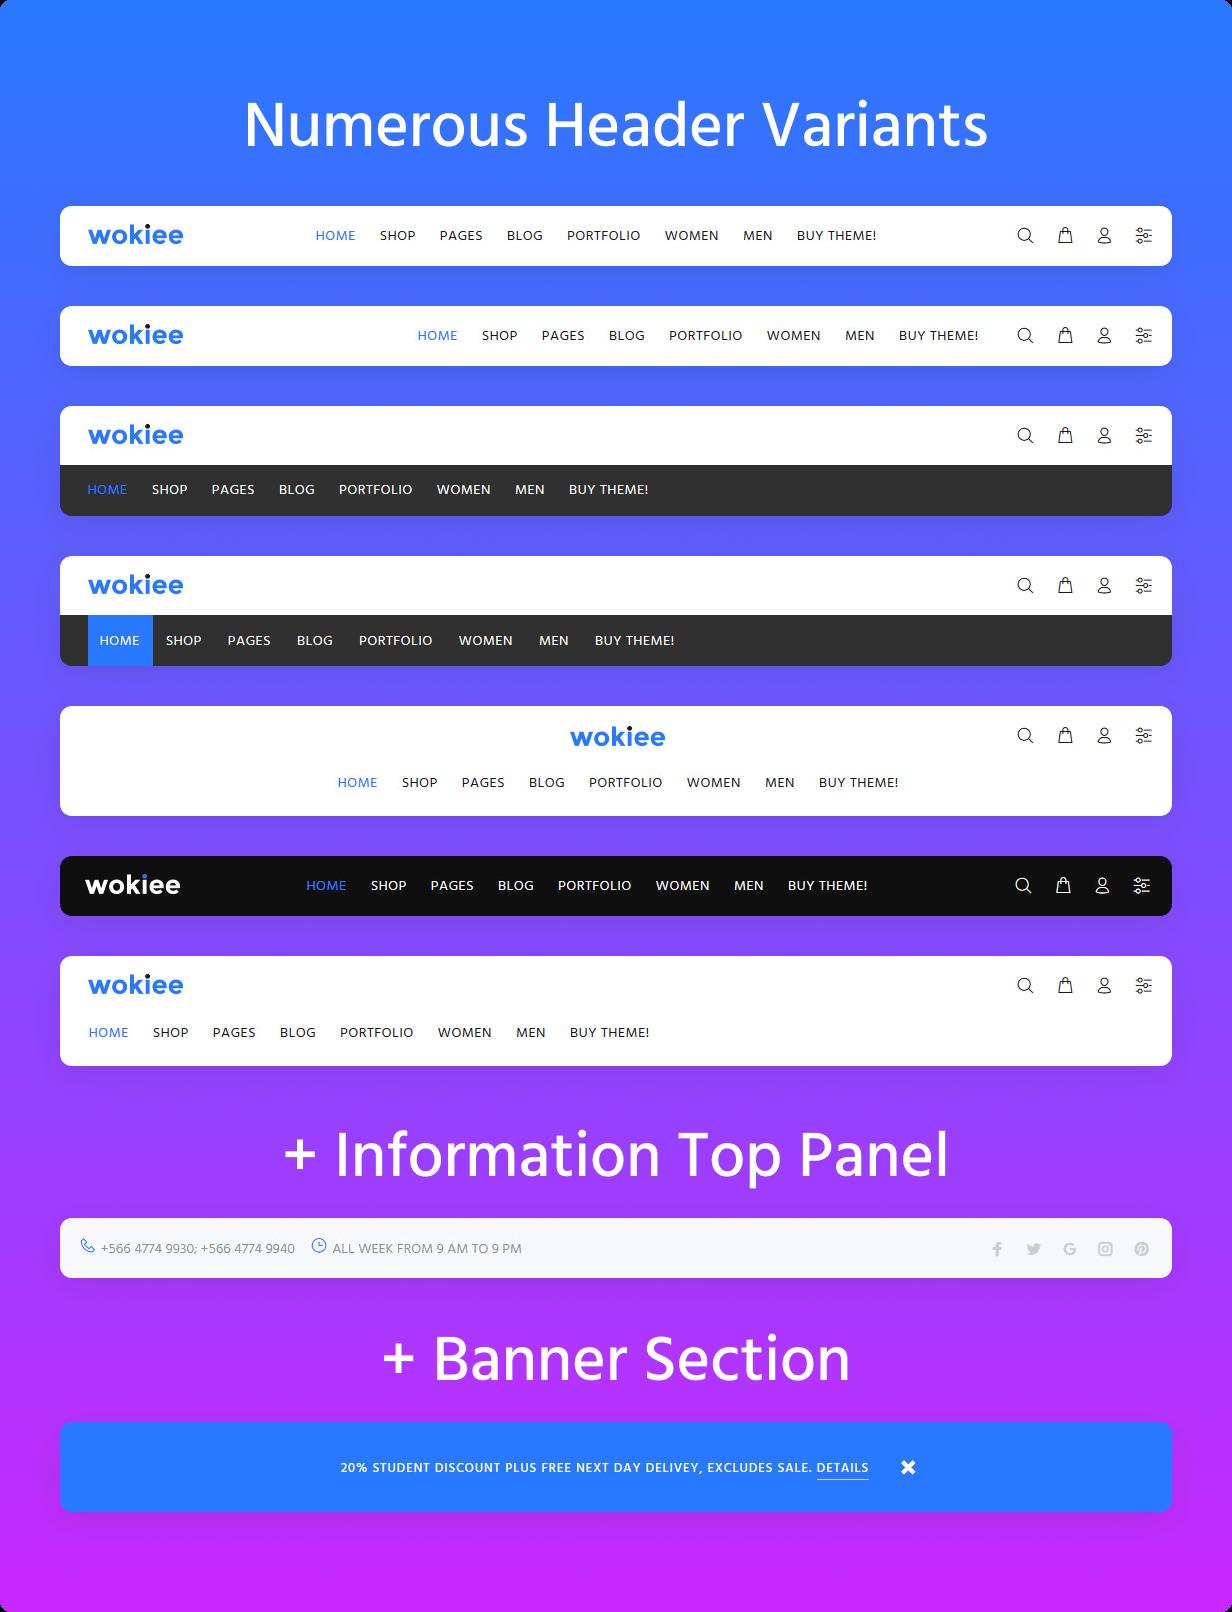 Wokiee - Ecommerce HTML Template - 7